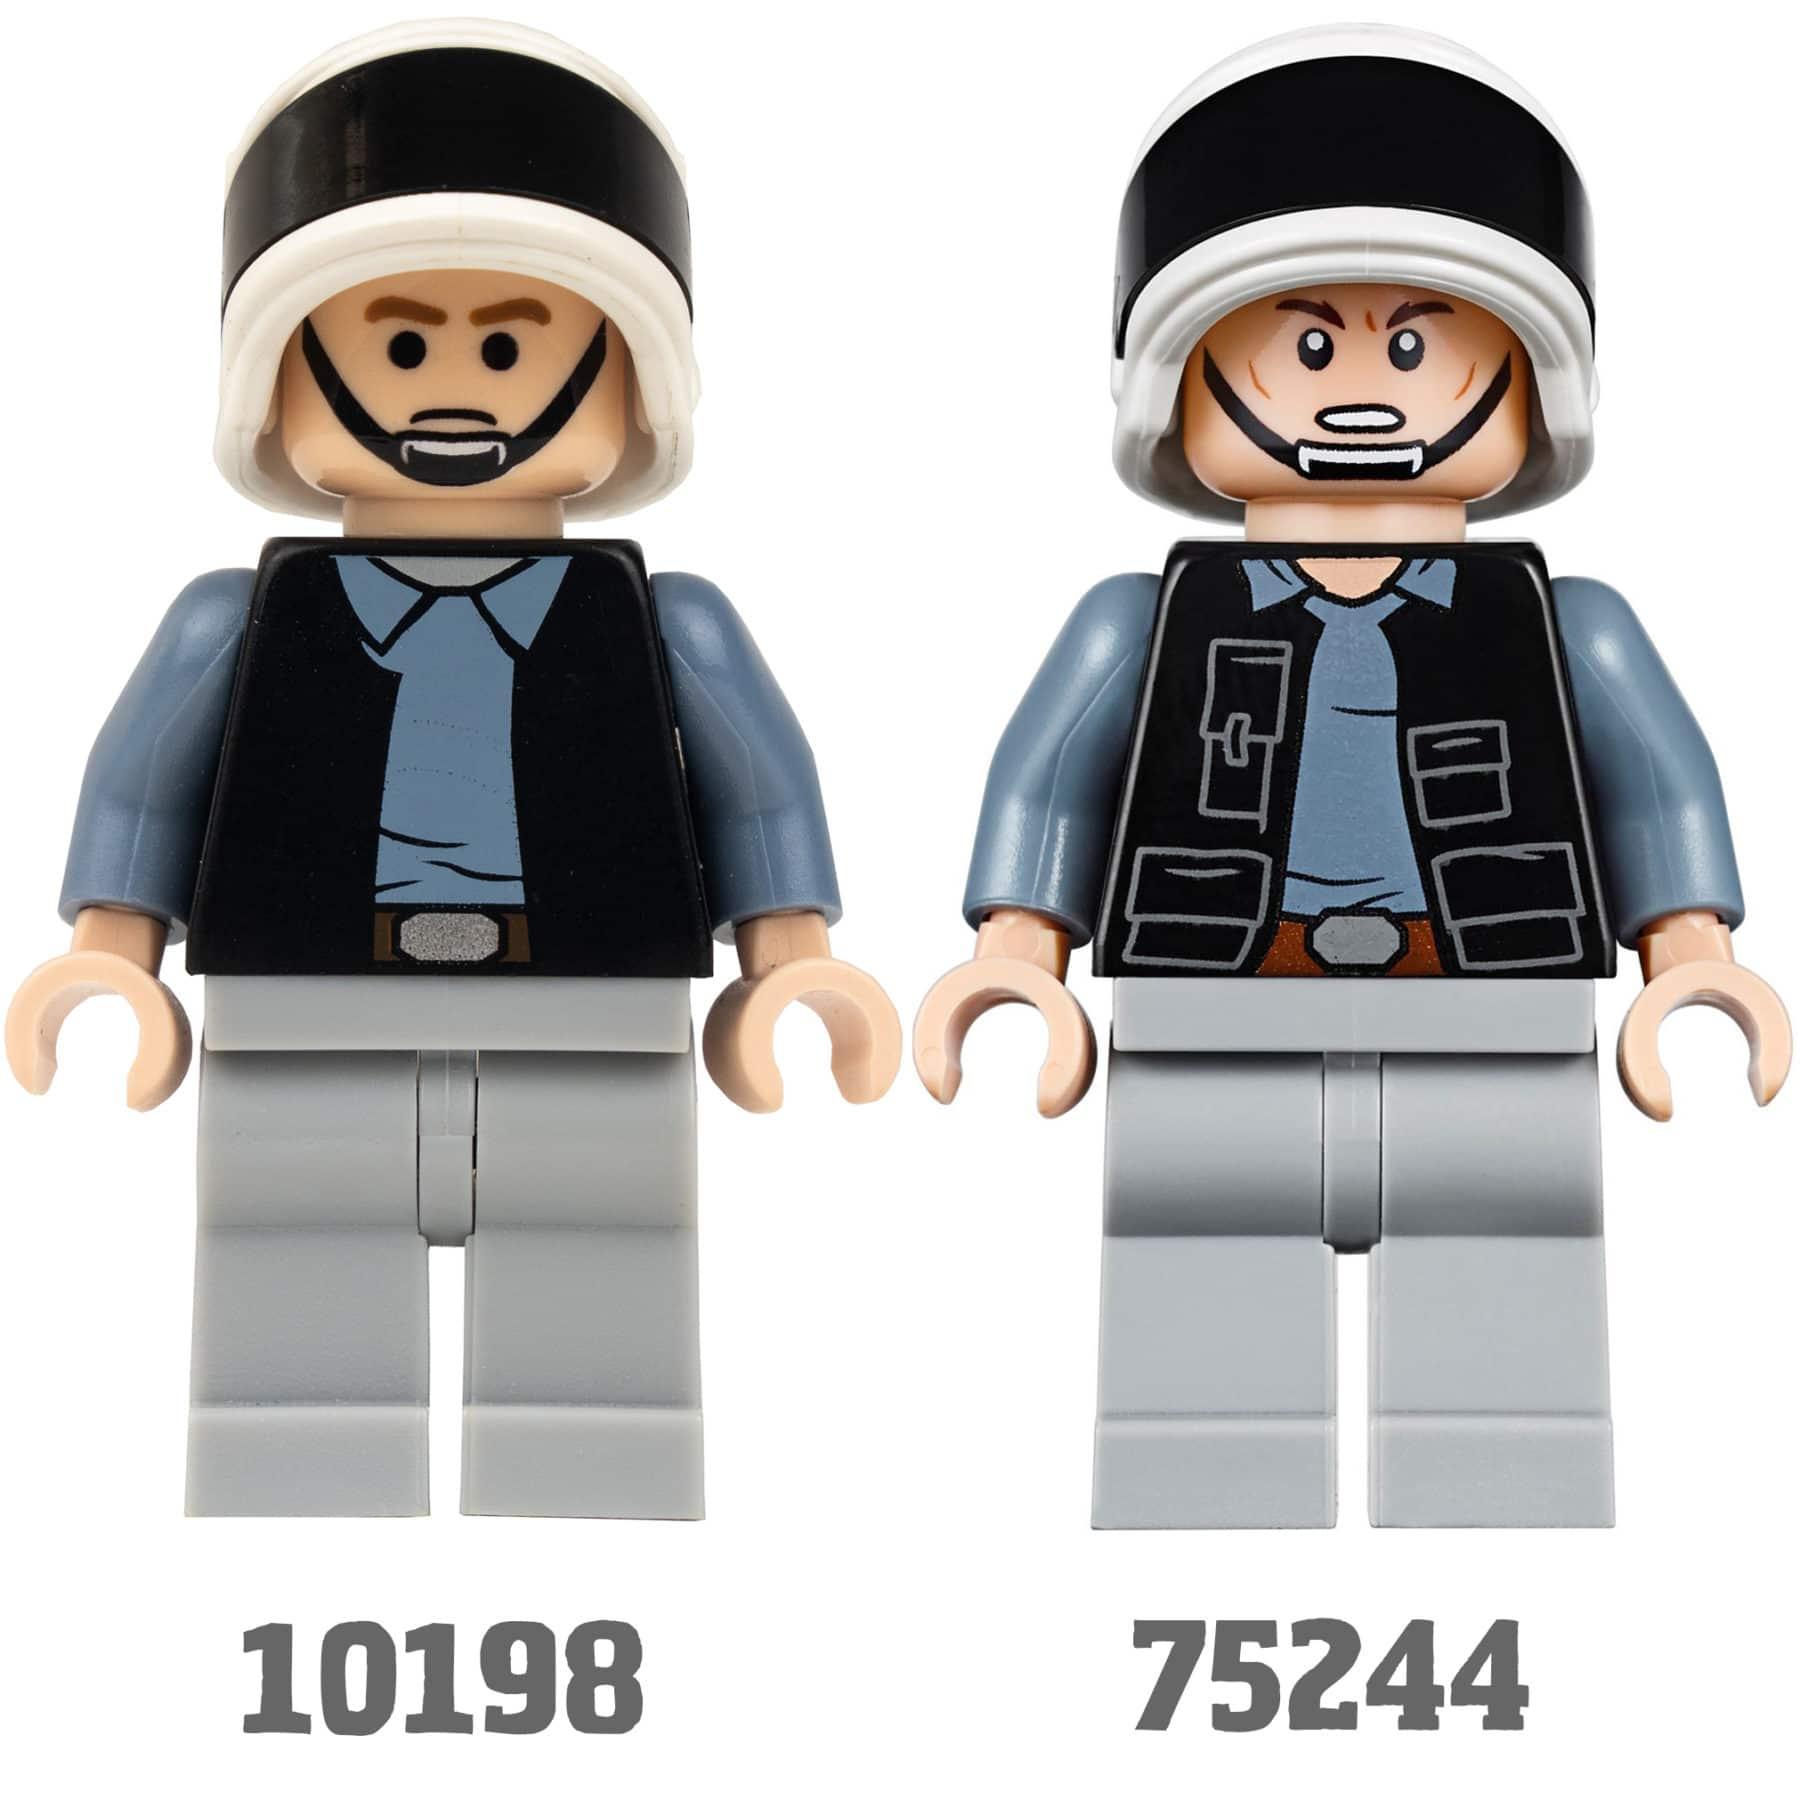 Tantive IV Rebellen Soldat Vergleich